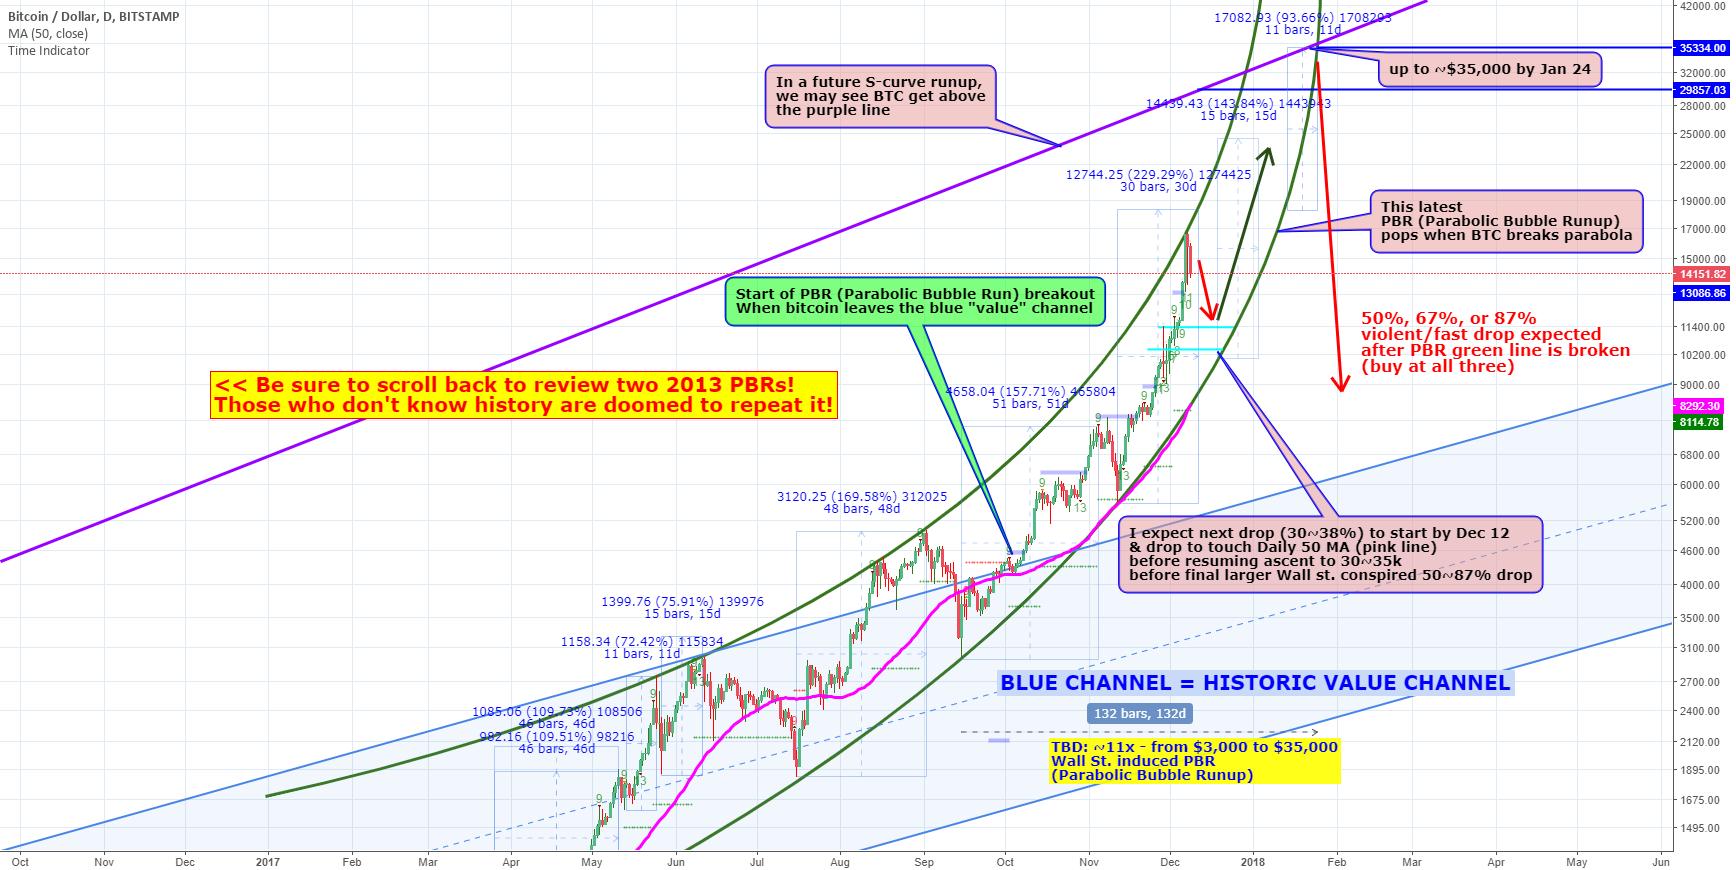 Dec 9 bitcoin (BTC) Parabolic Bubble Run forecast w/2013 data